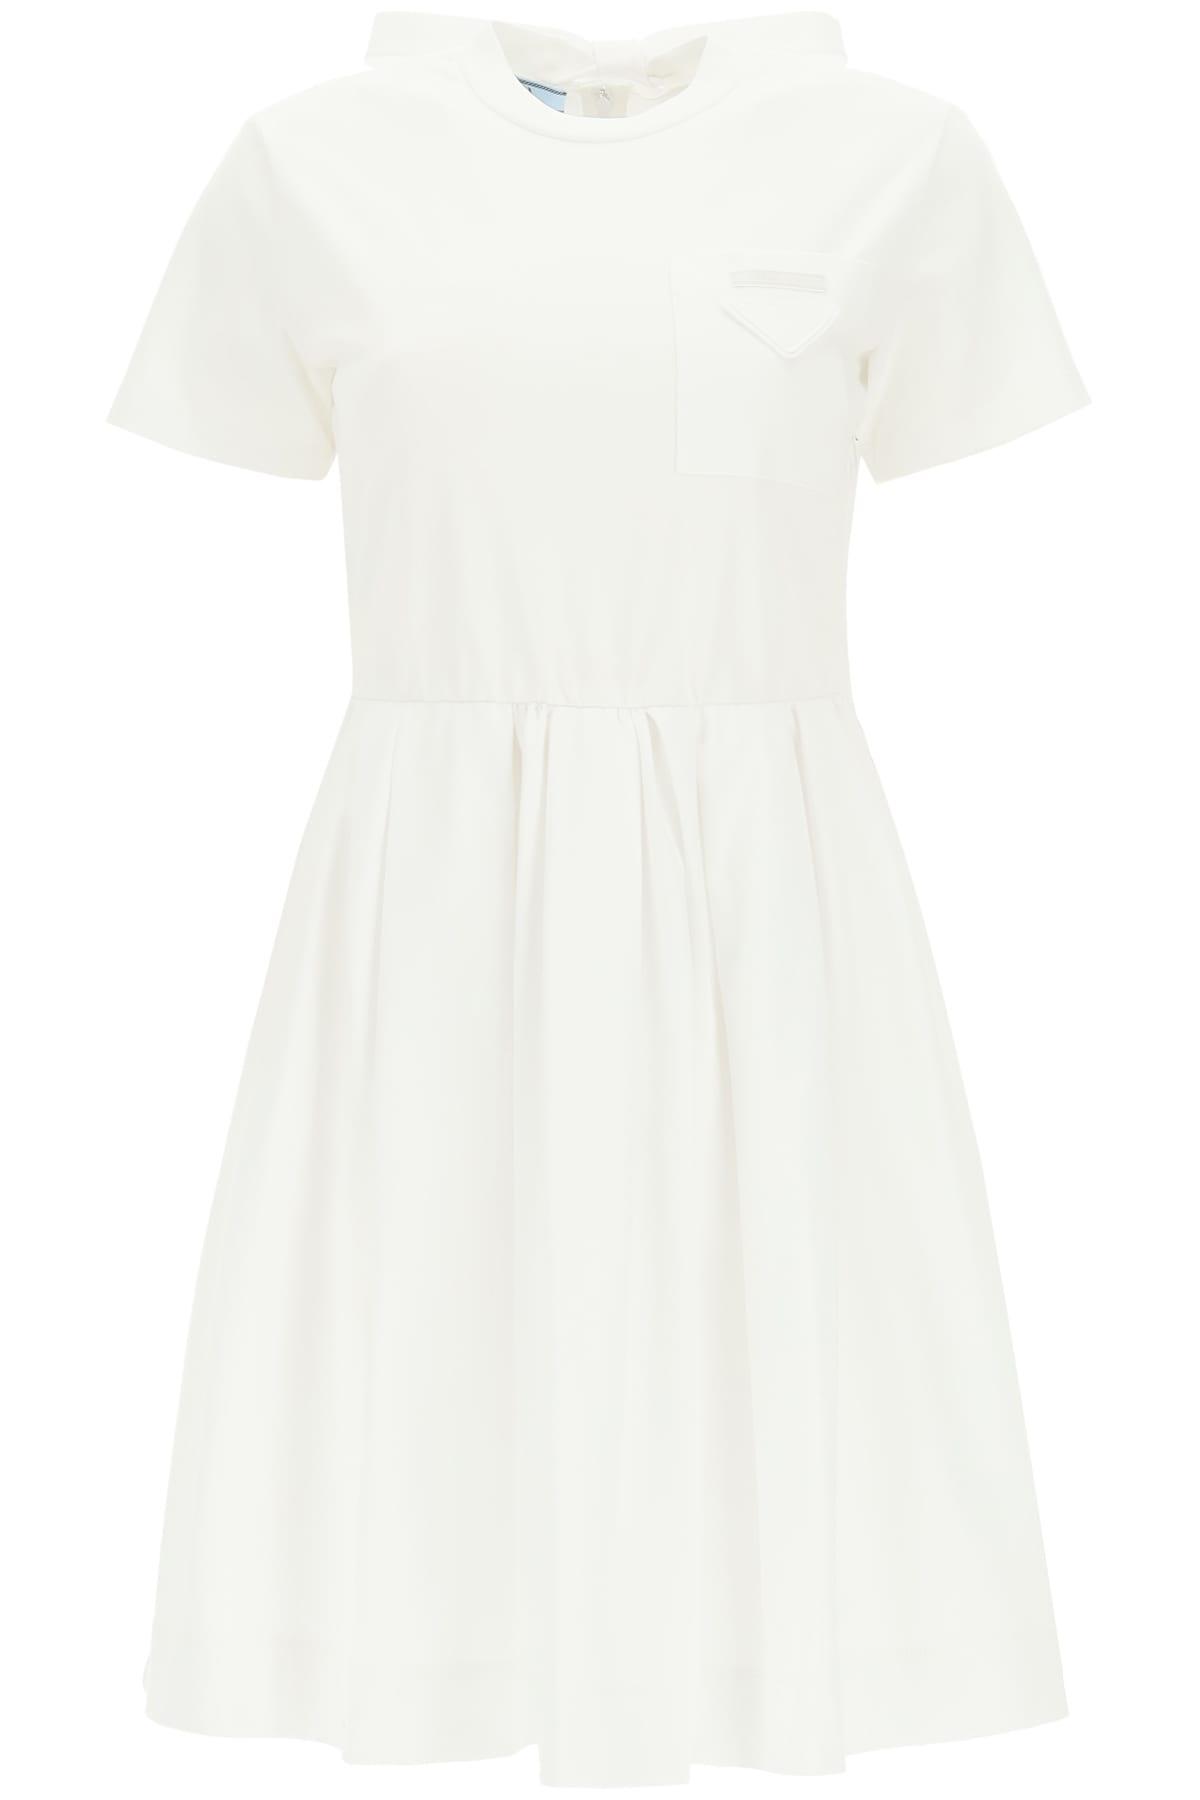 Prada Cotton Jersey Dress